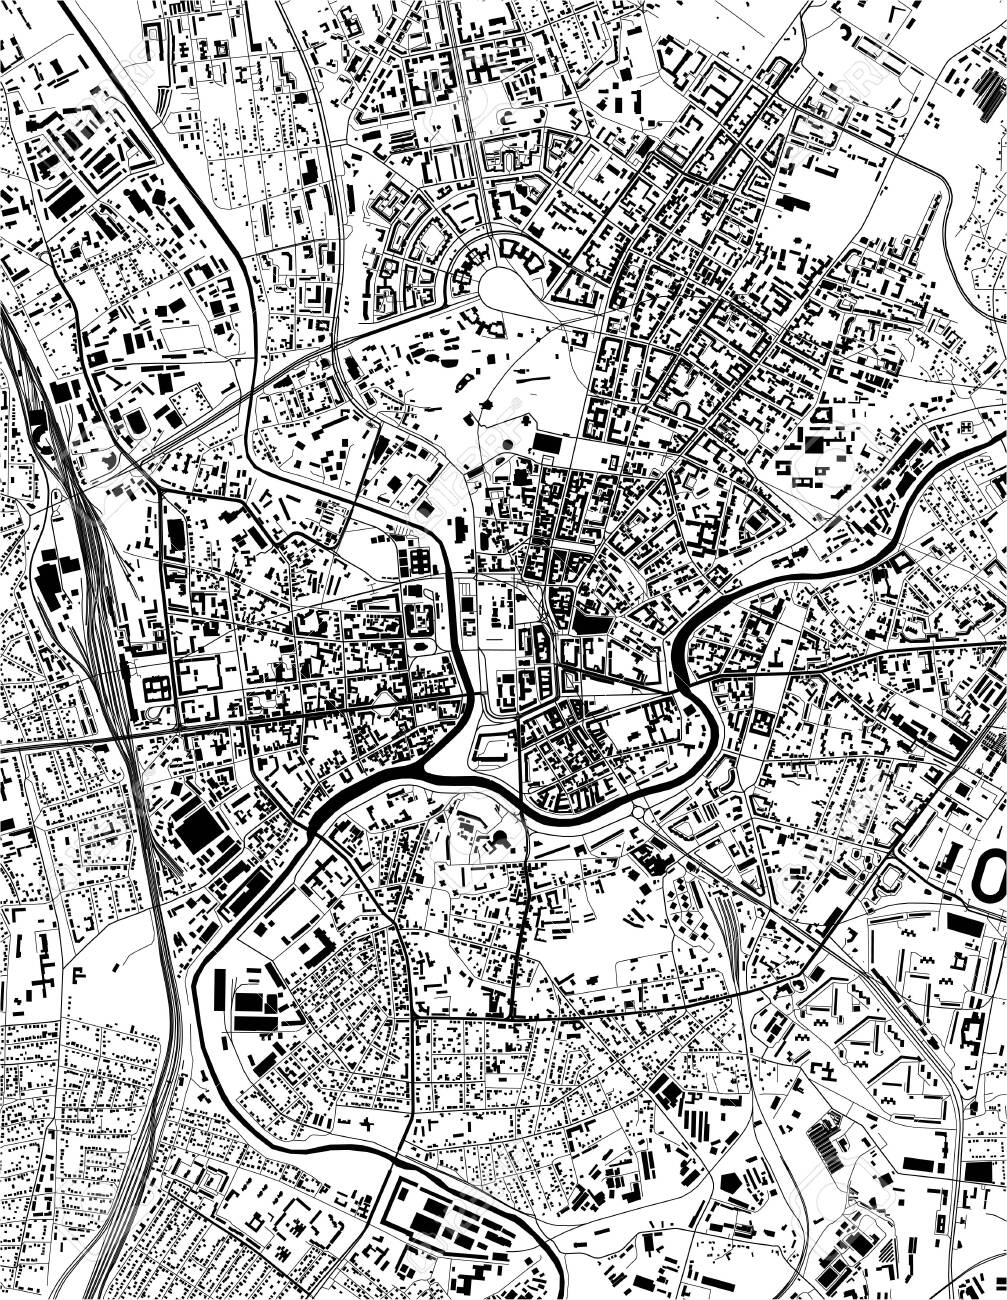 map of the city of Kharkiv, Ukraine - 151096964